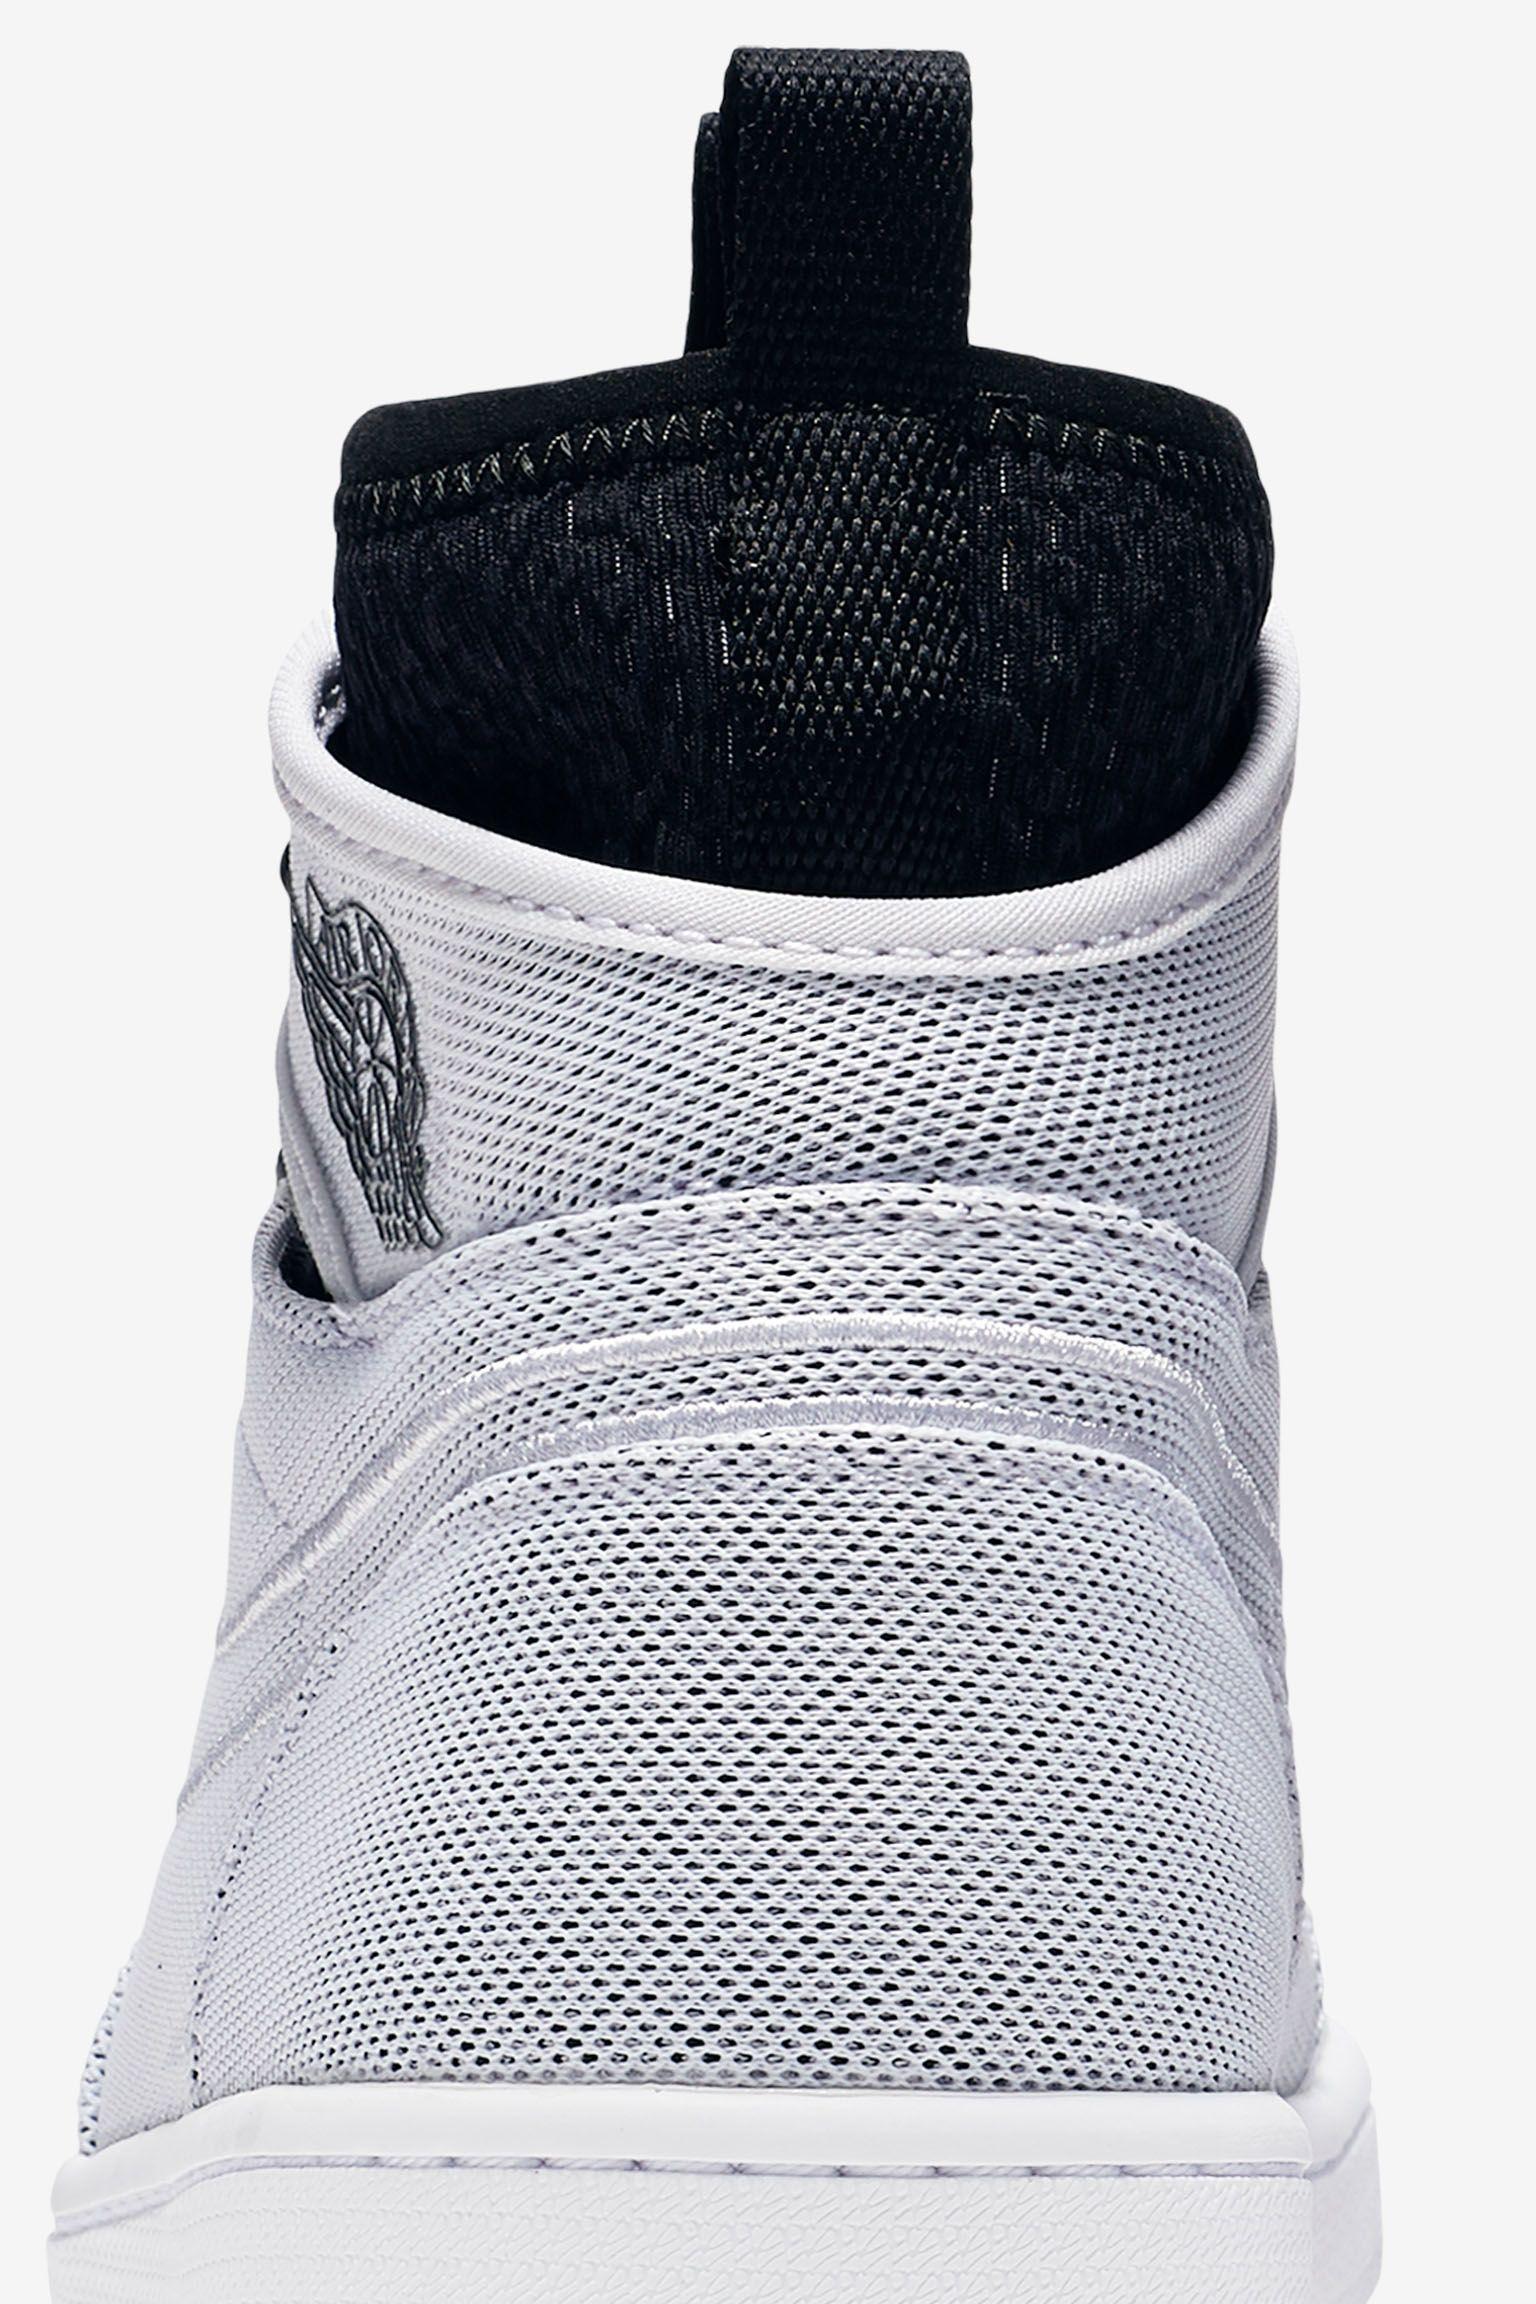 Air Jordan 1 Retro Ultra 'Black, White & Platinum' Release Date